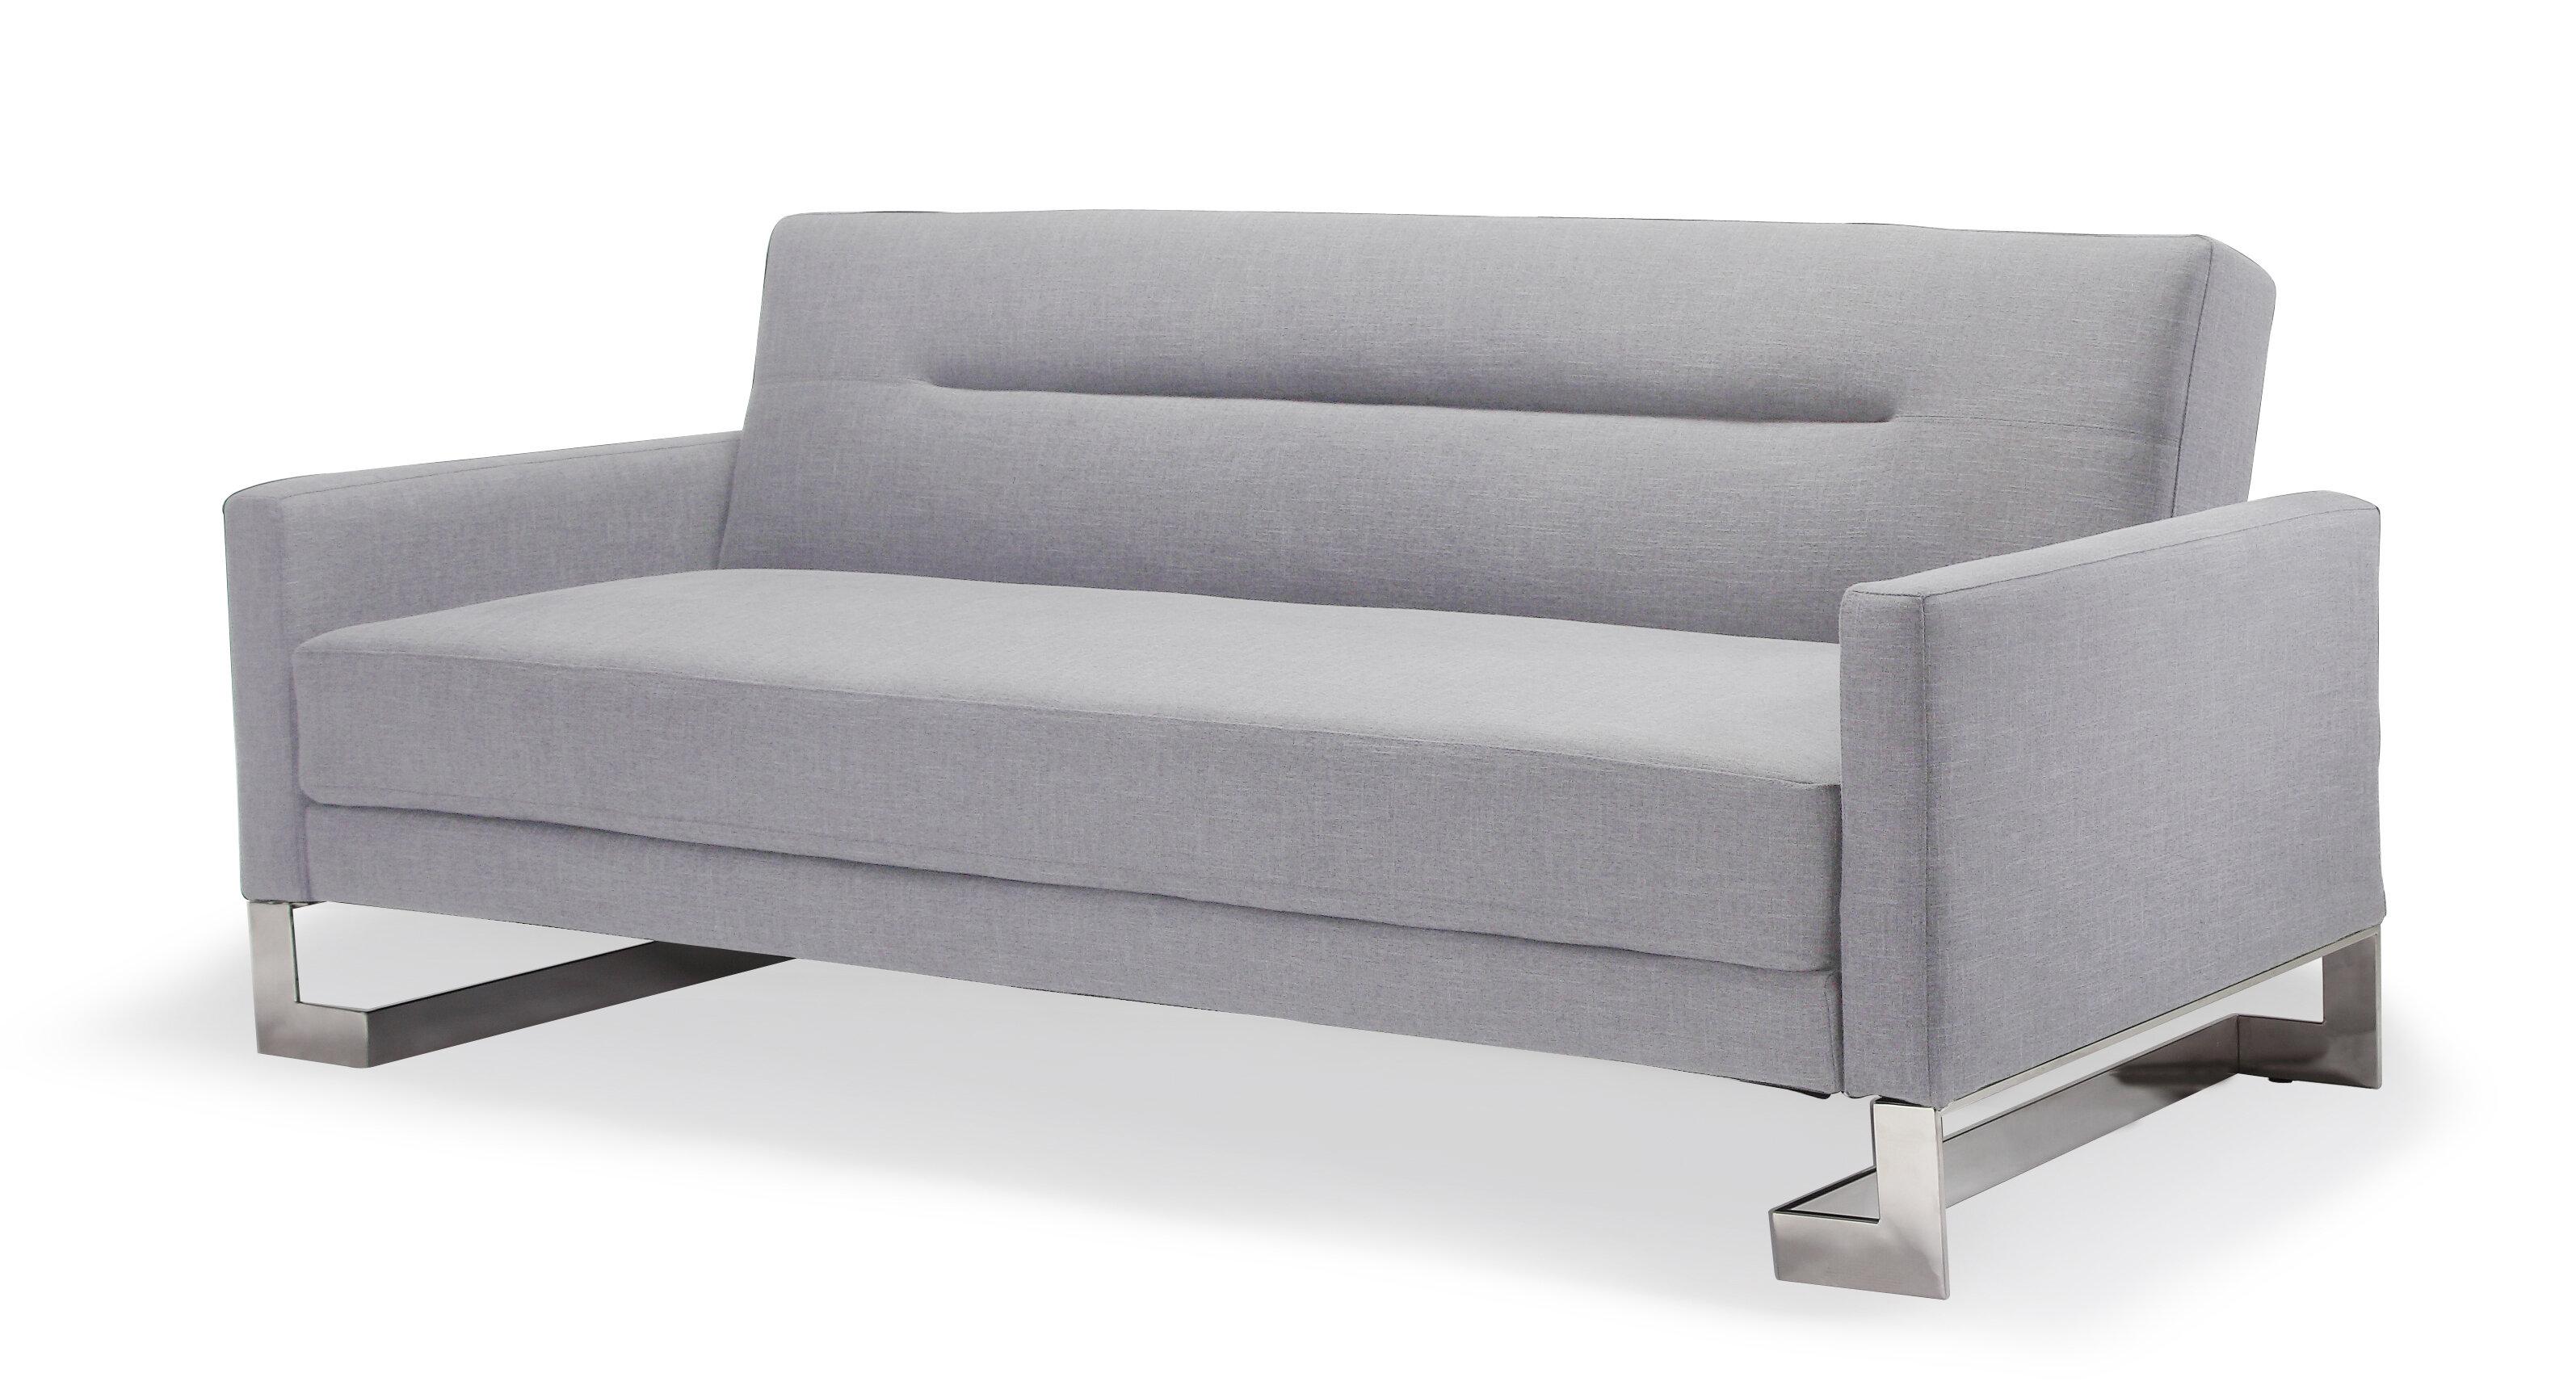 at home usa modern sleeper sofa reviews wayfair rh wayfair com modern sleeper sofas for small spaces modern sleeper sofas queen